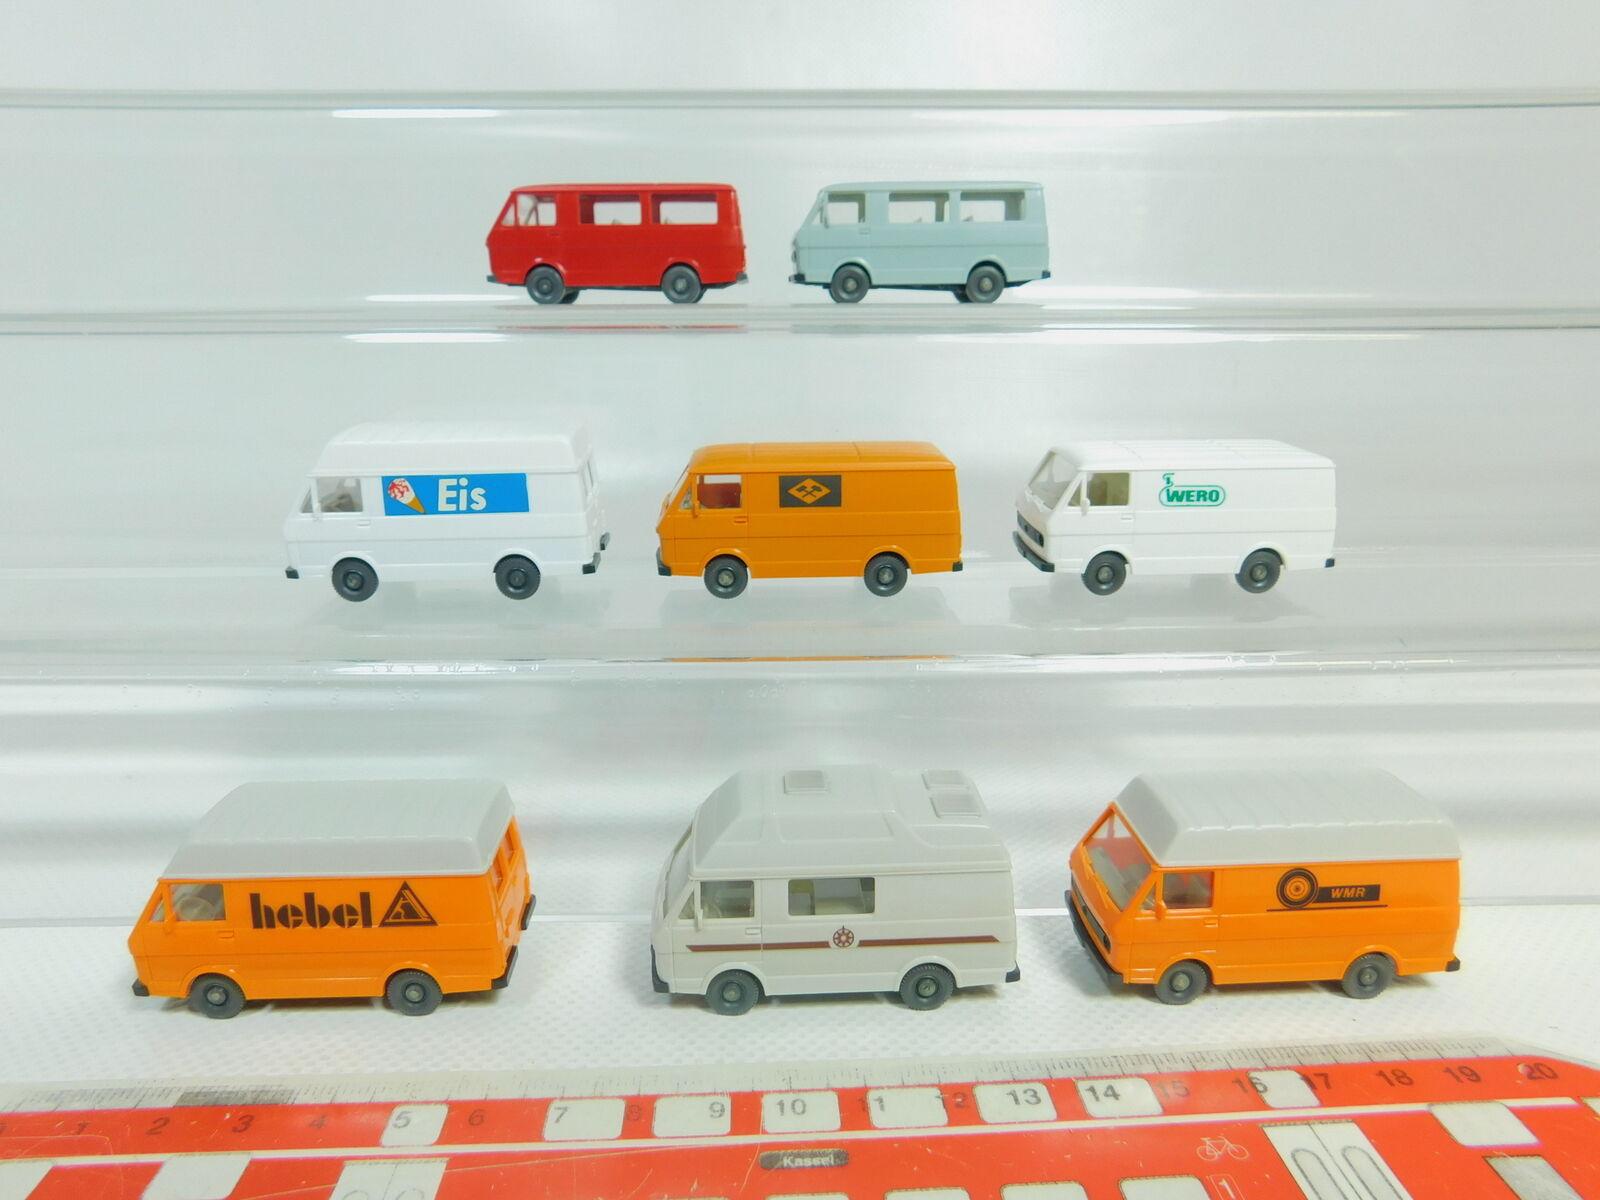 BO565-0,5 x x x Wiking H0   1 87 Modelo VW Lt 28  Helado + Palanca + Wero + Wmr a7ed5e